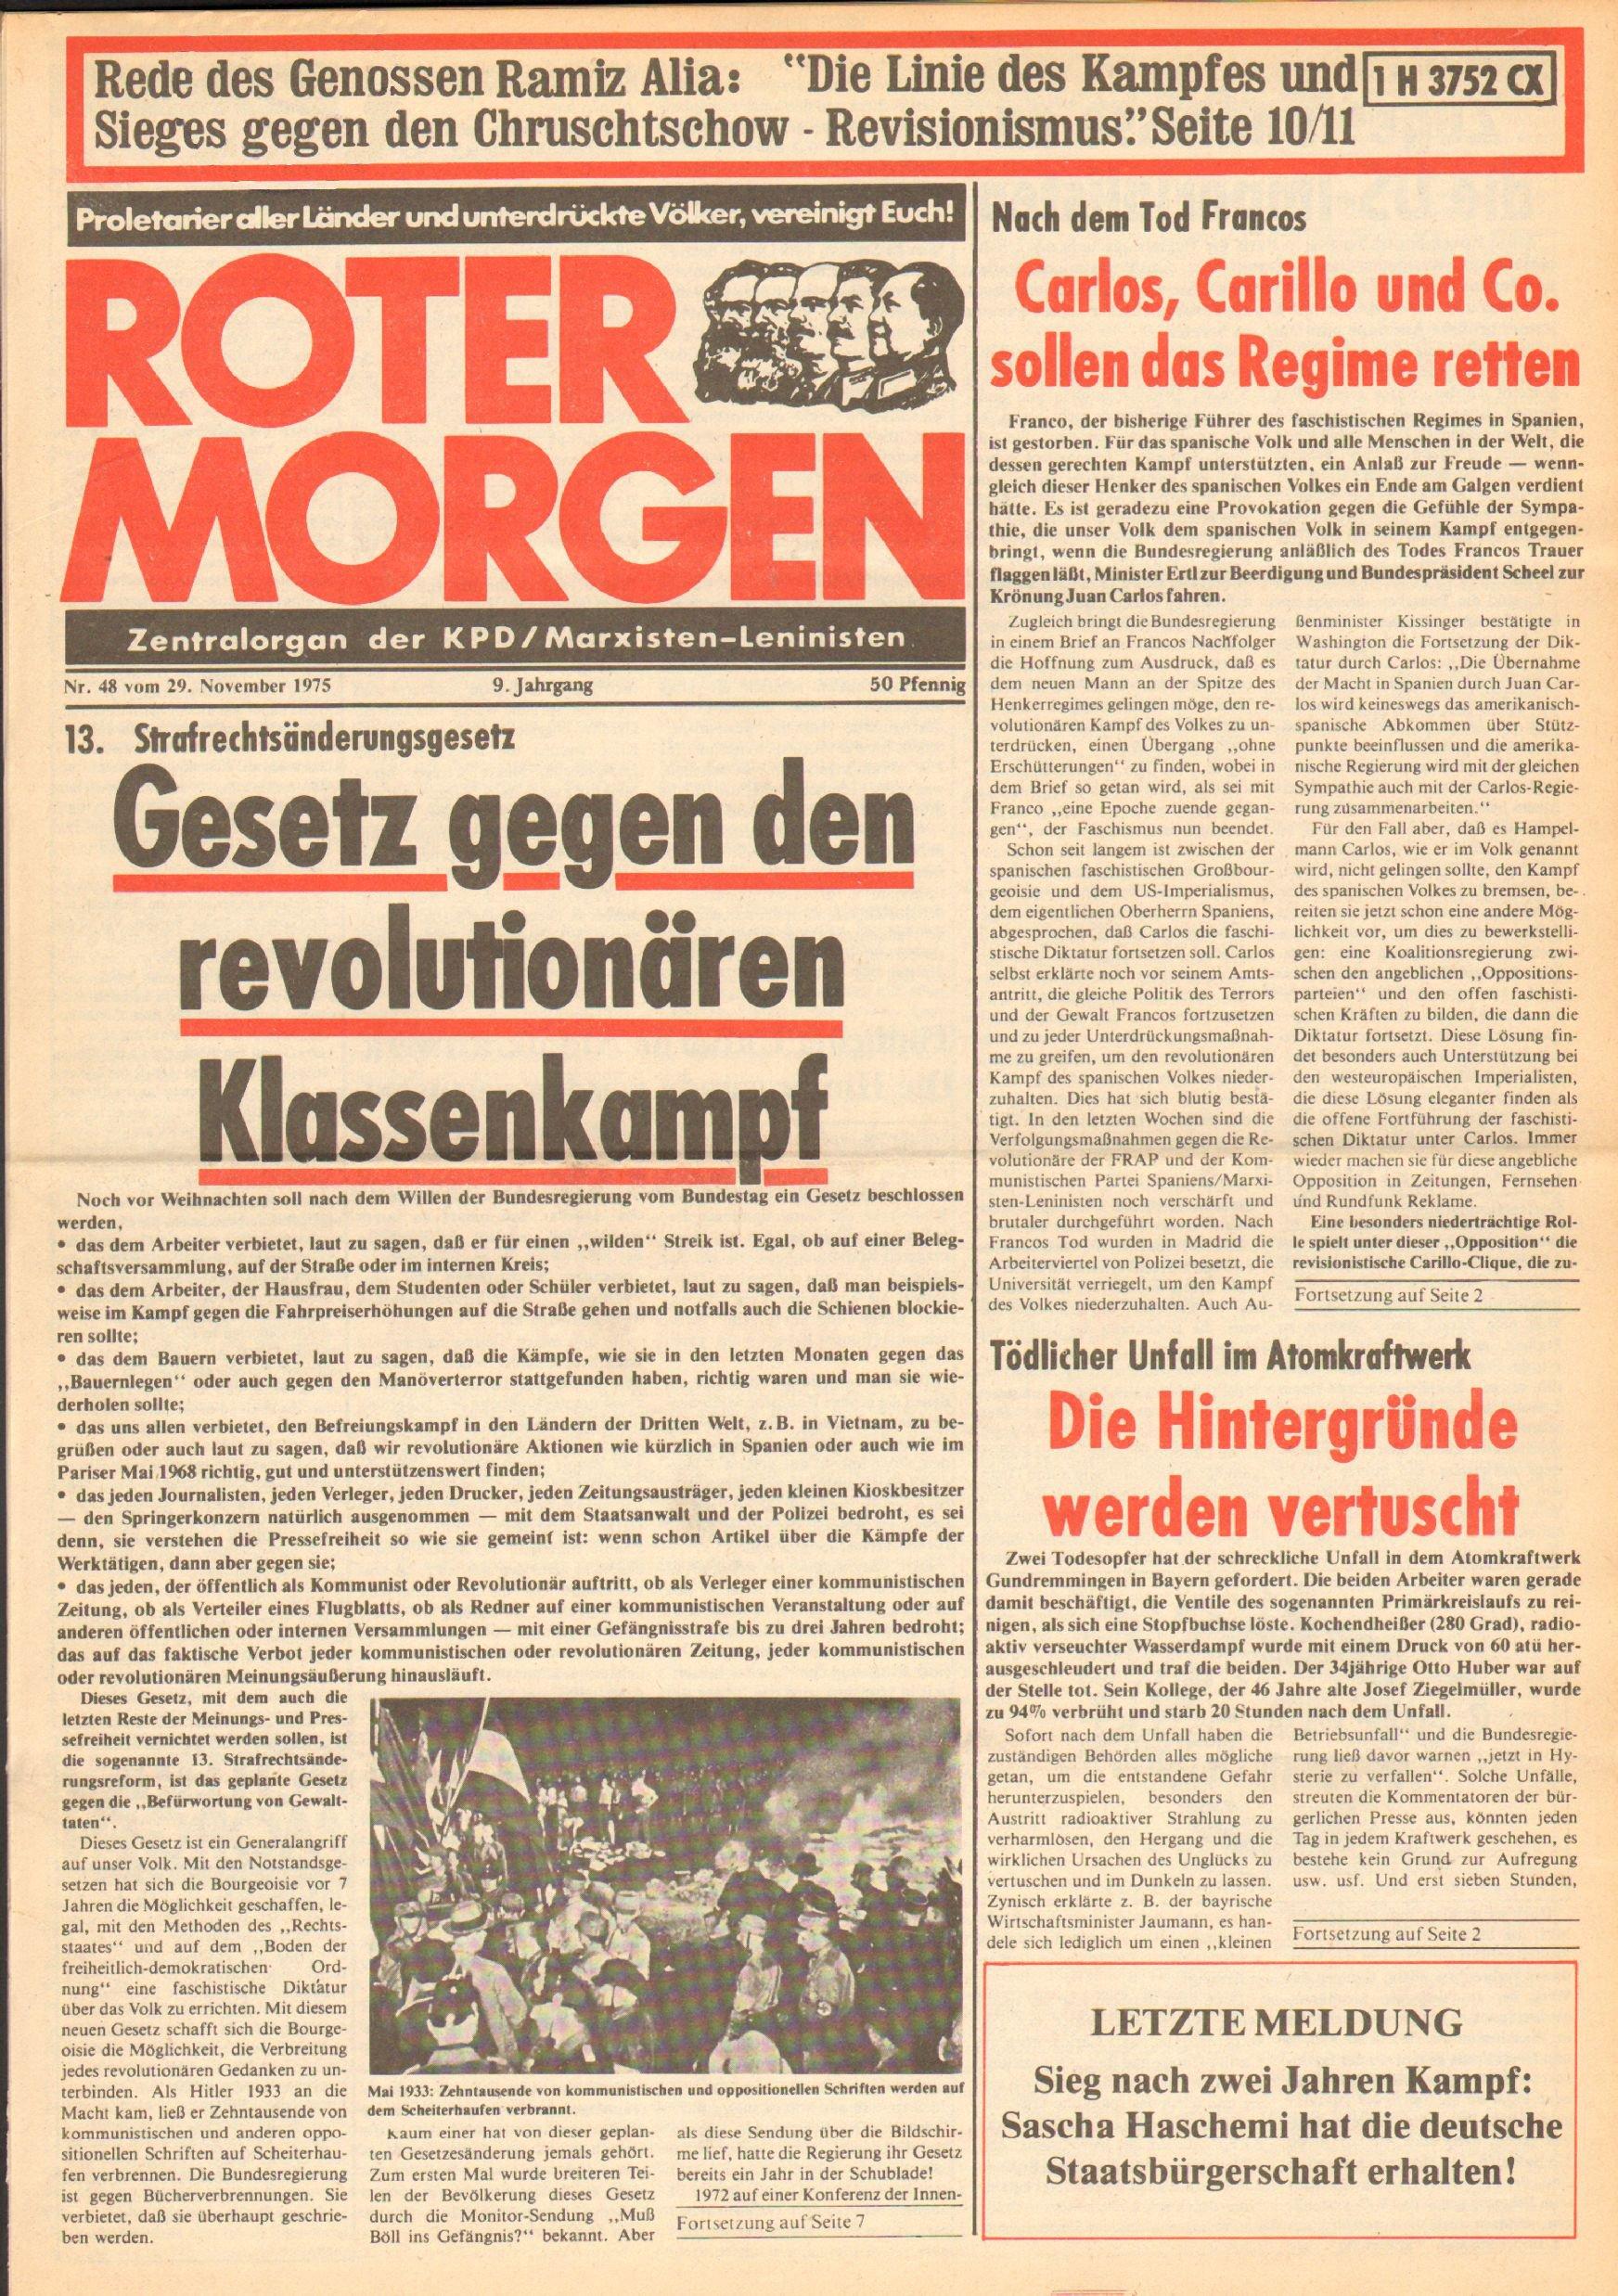 Roter Morgen, 9. Jg., 29. November 1975, Nr. 48, Seite 1